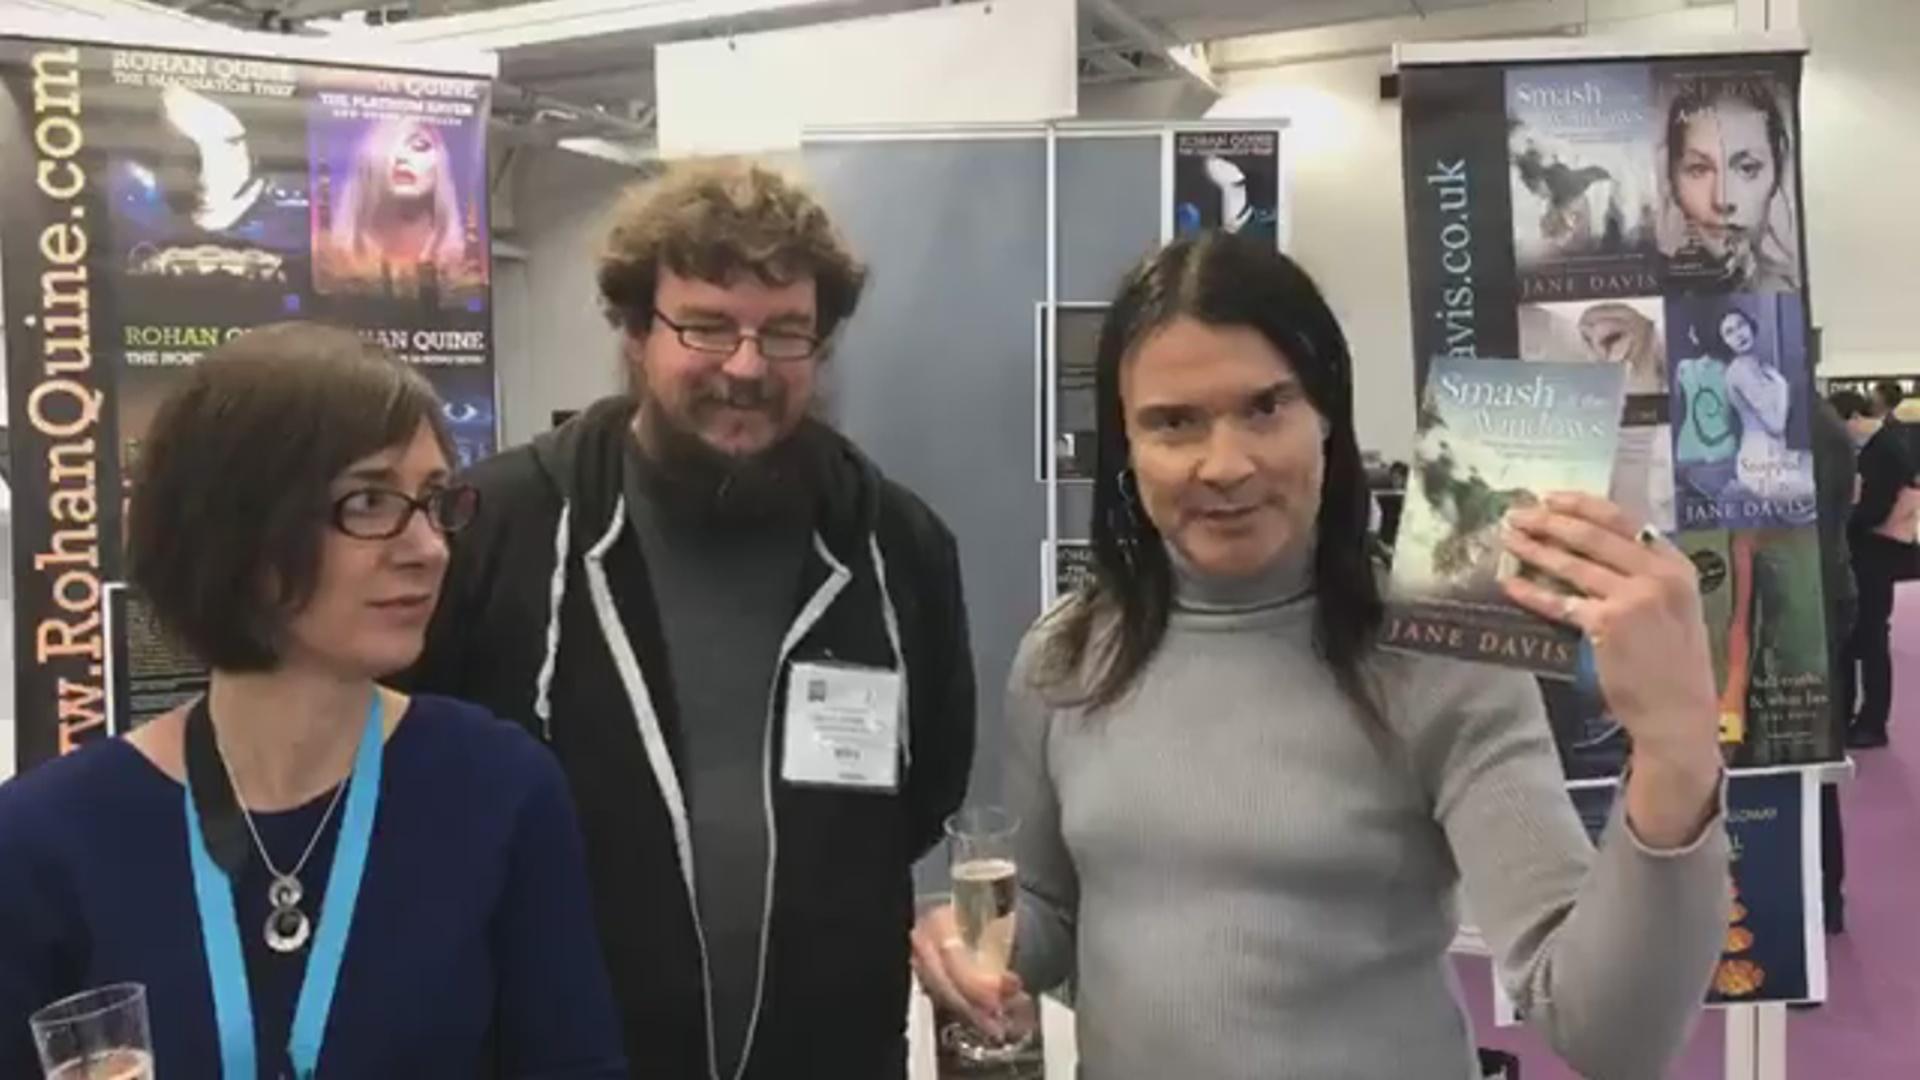 LBF18 launch of Rohan Quine's 'The Beasts of Electra Drive', Dan Holloway's 'Kill Land' & Jane Davis's 'Smash all the Windows' - 4